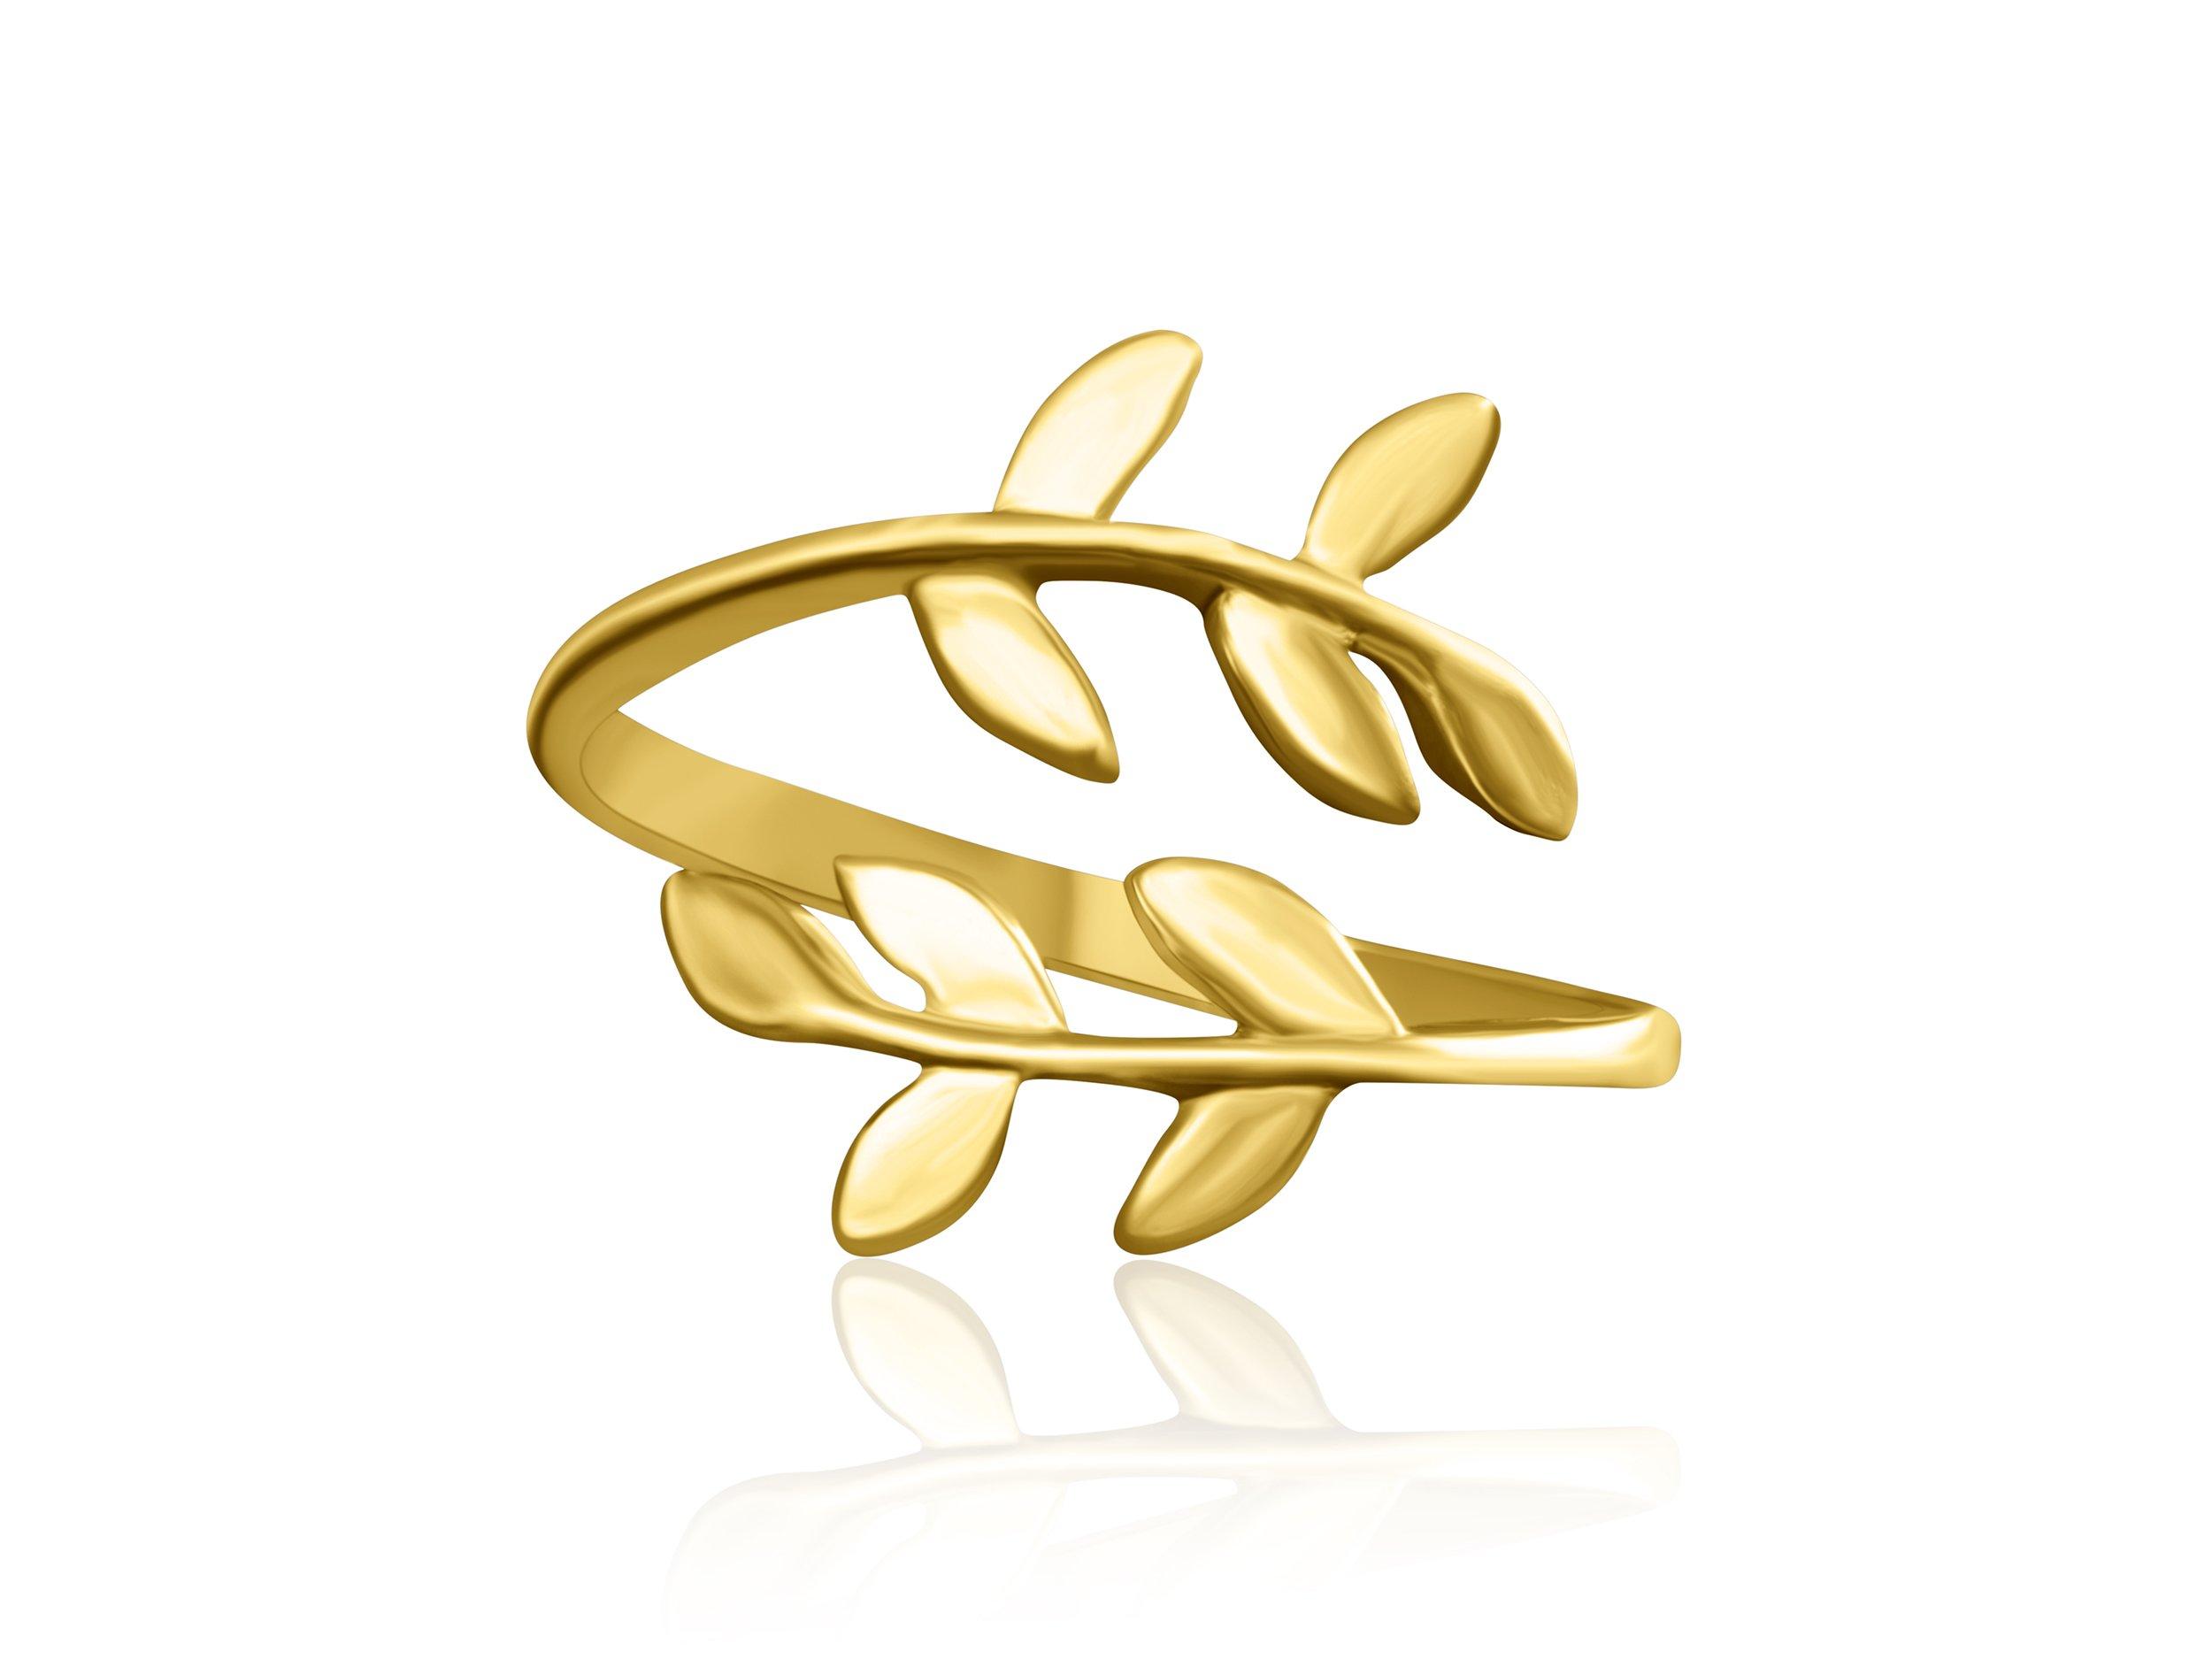 ONDAISY 14K Matte Gold Plated Bff Best Friends Bohemian Boho Jewelry Tree Flower Leaves Laurel Leaf Knuckle Toe Adjustable Band Ring